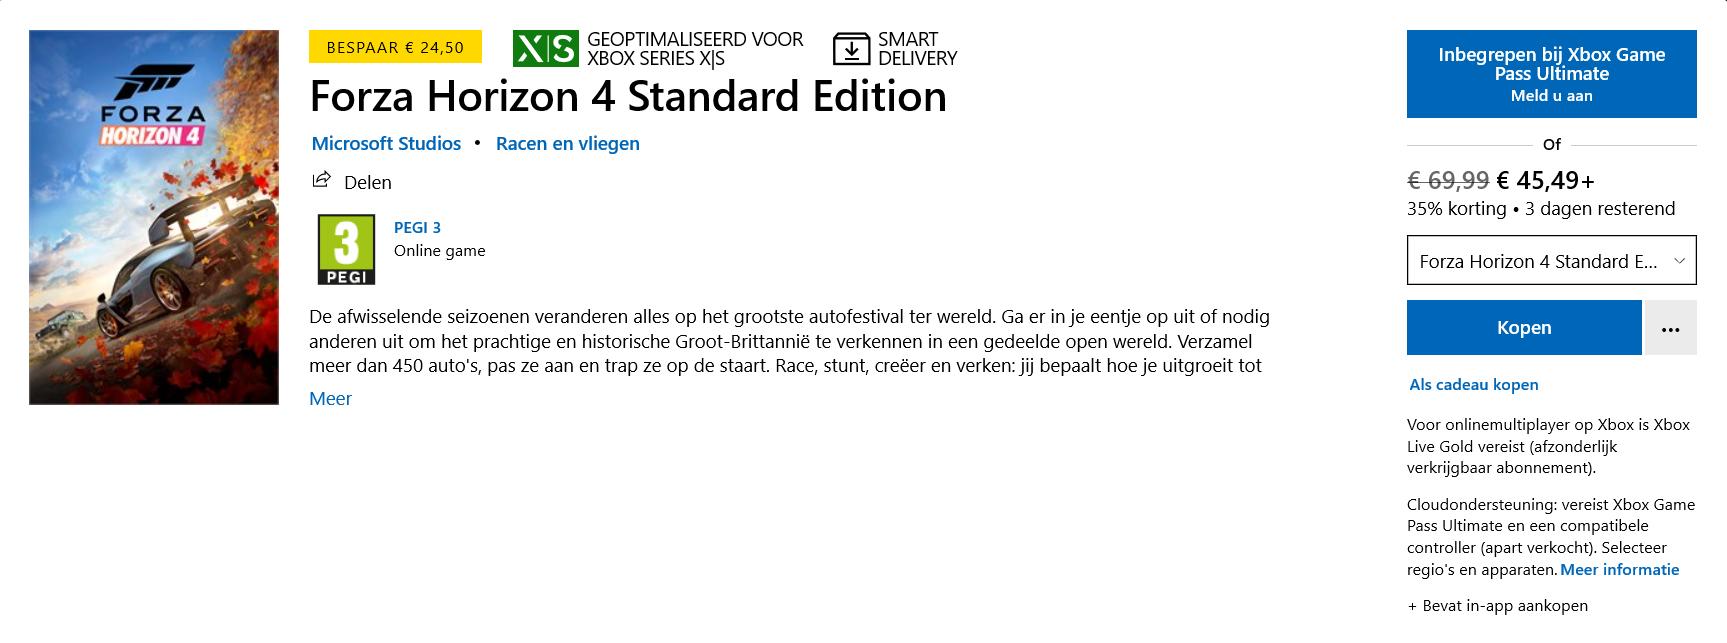 Forza Horizon 4 Standard Edition voor PC/Xbox One/Xbox Series X & S